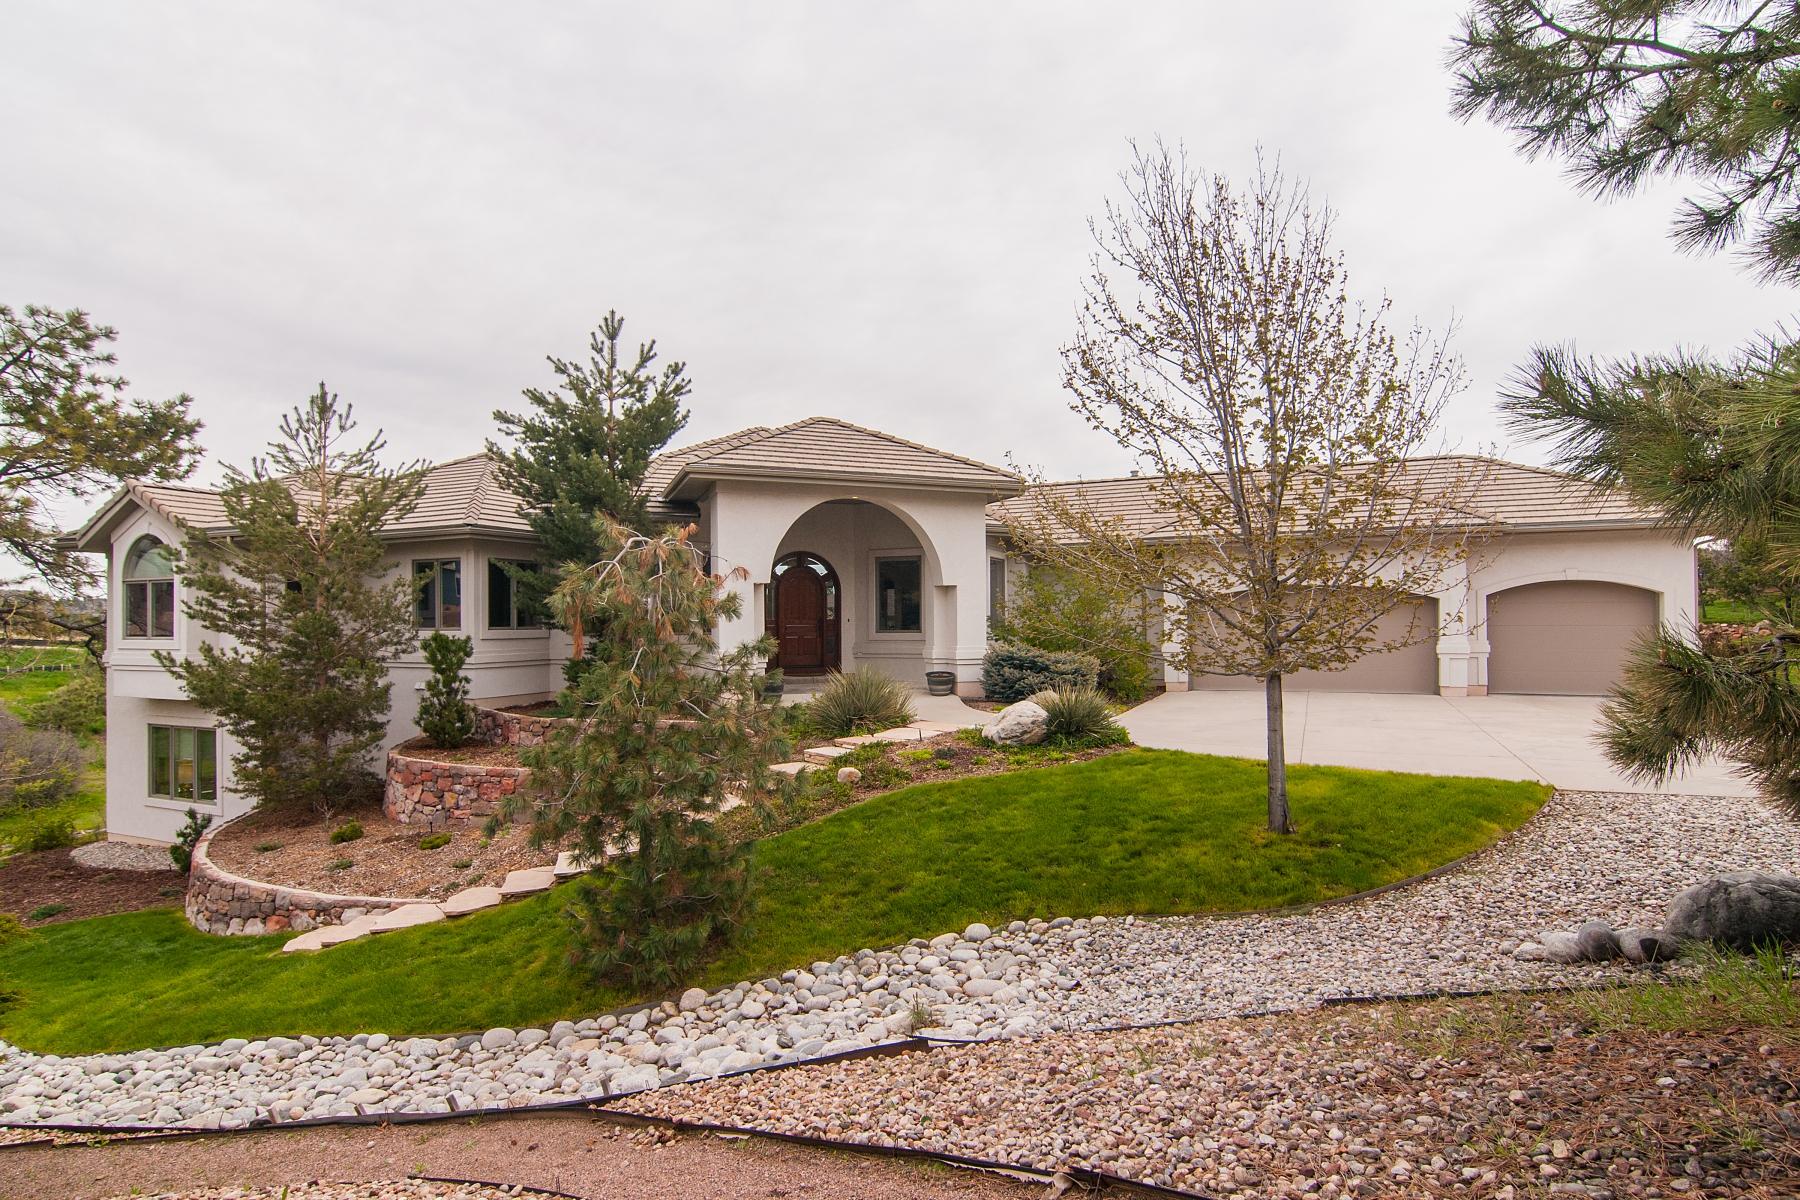 Single Family Home for Sale at 2085 Kahala Cir Castle Rock, Colorado 80104 United States